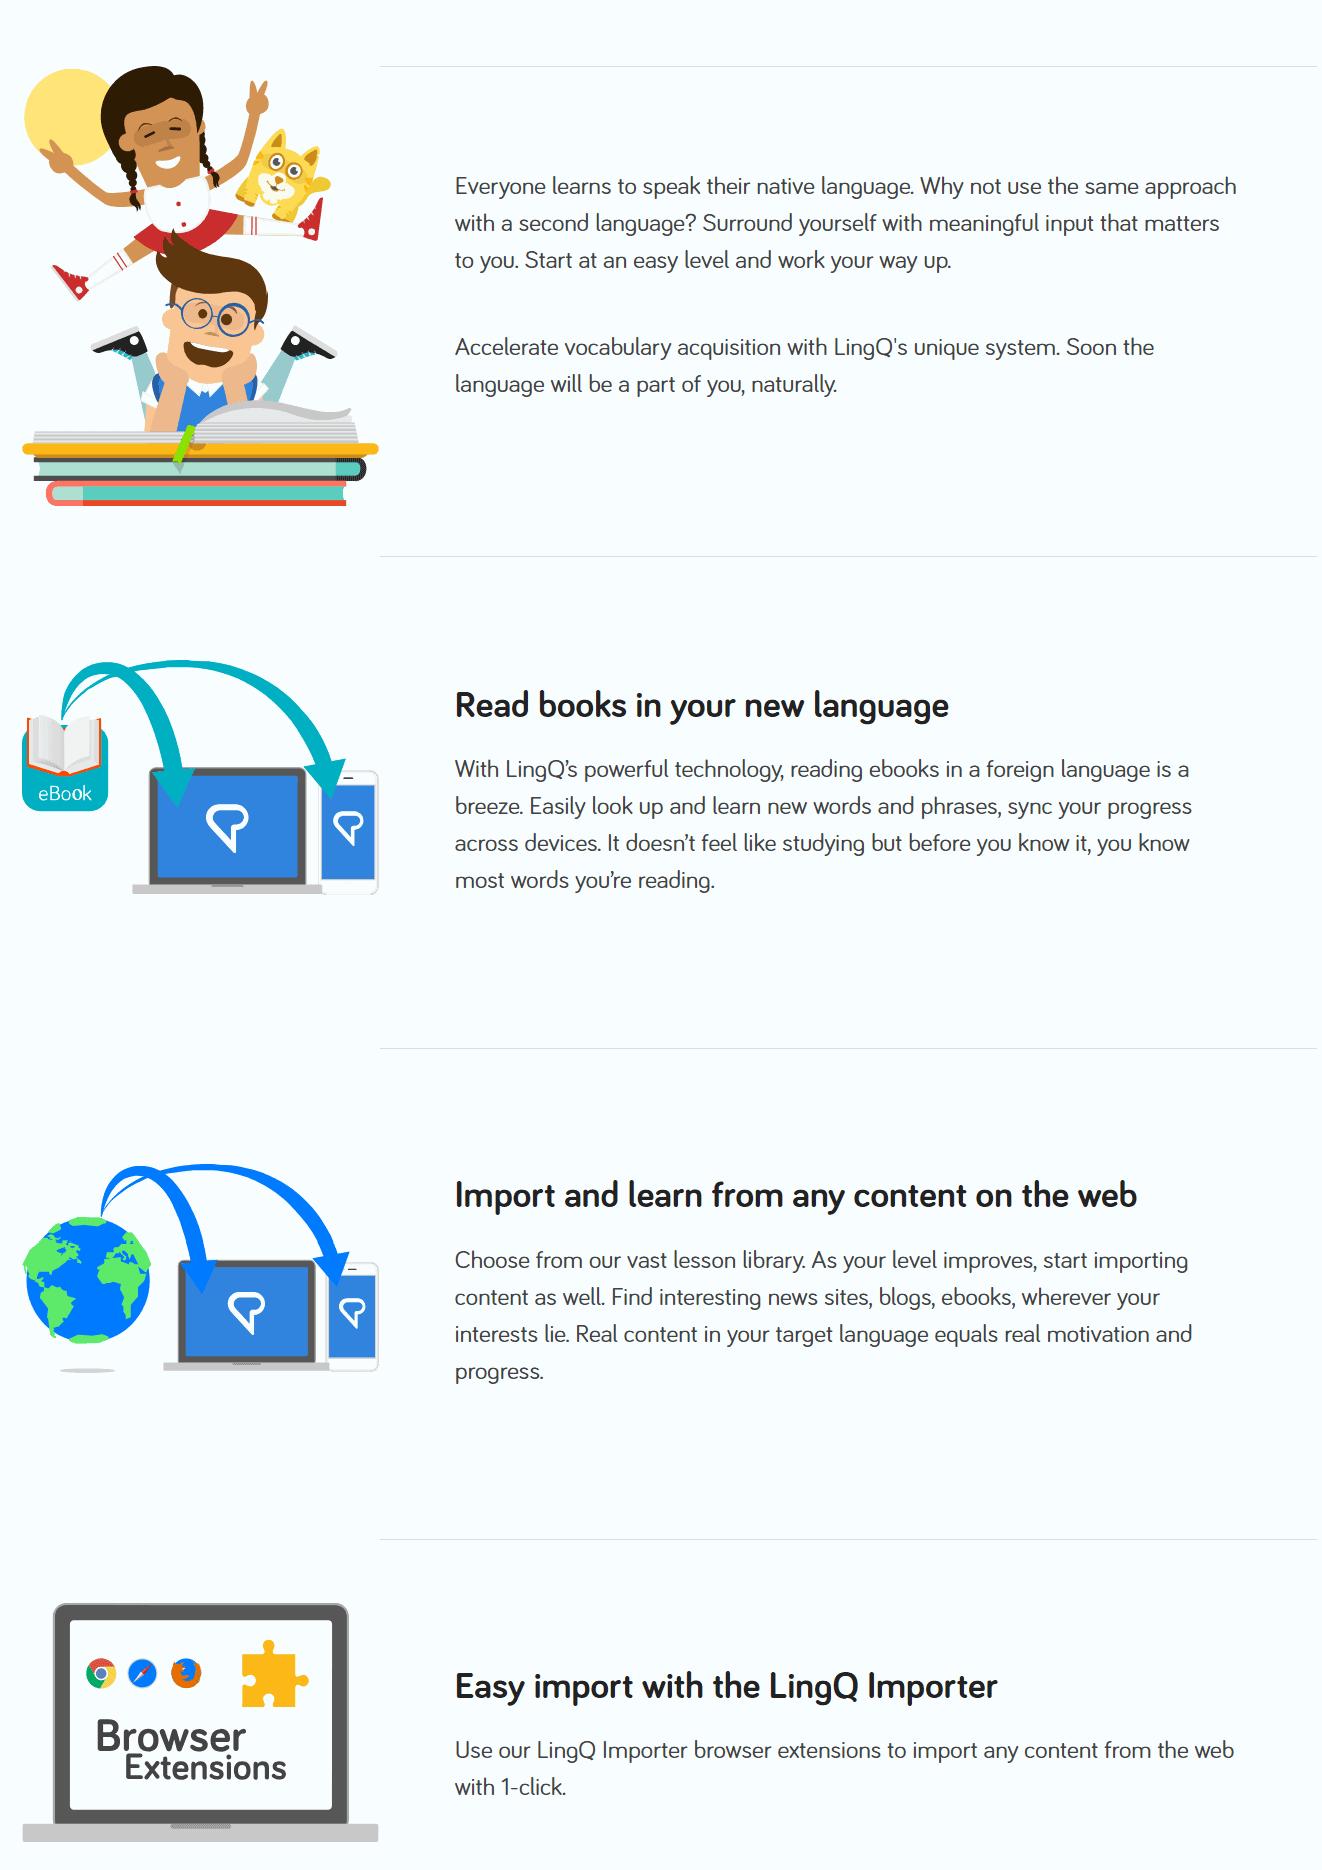 LingQ Coupon Codes- Why Choose LingQ